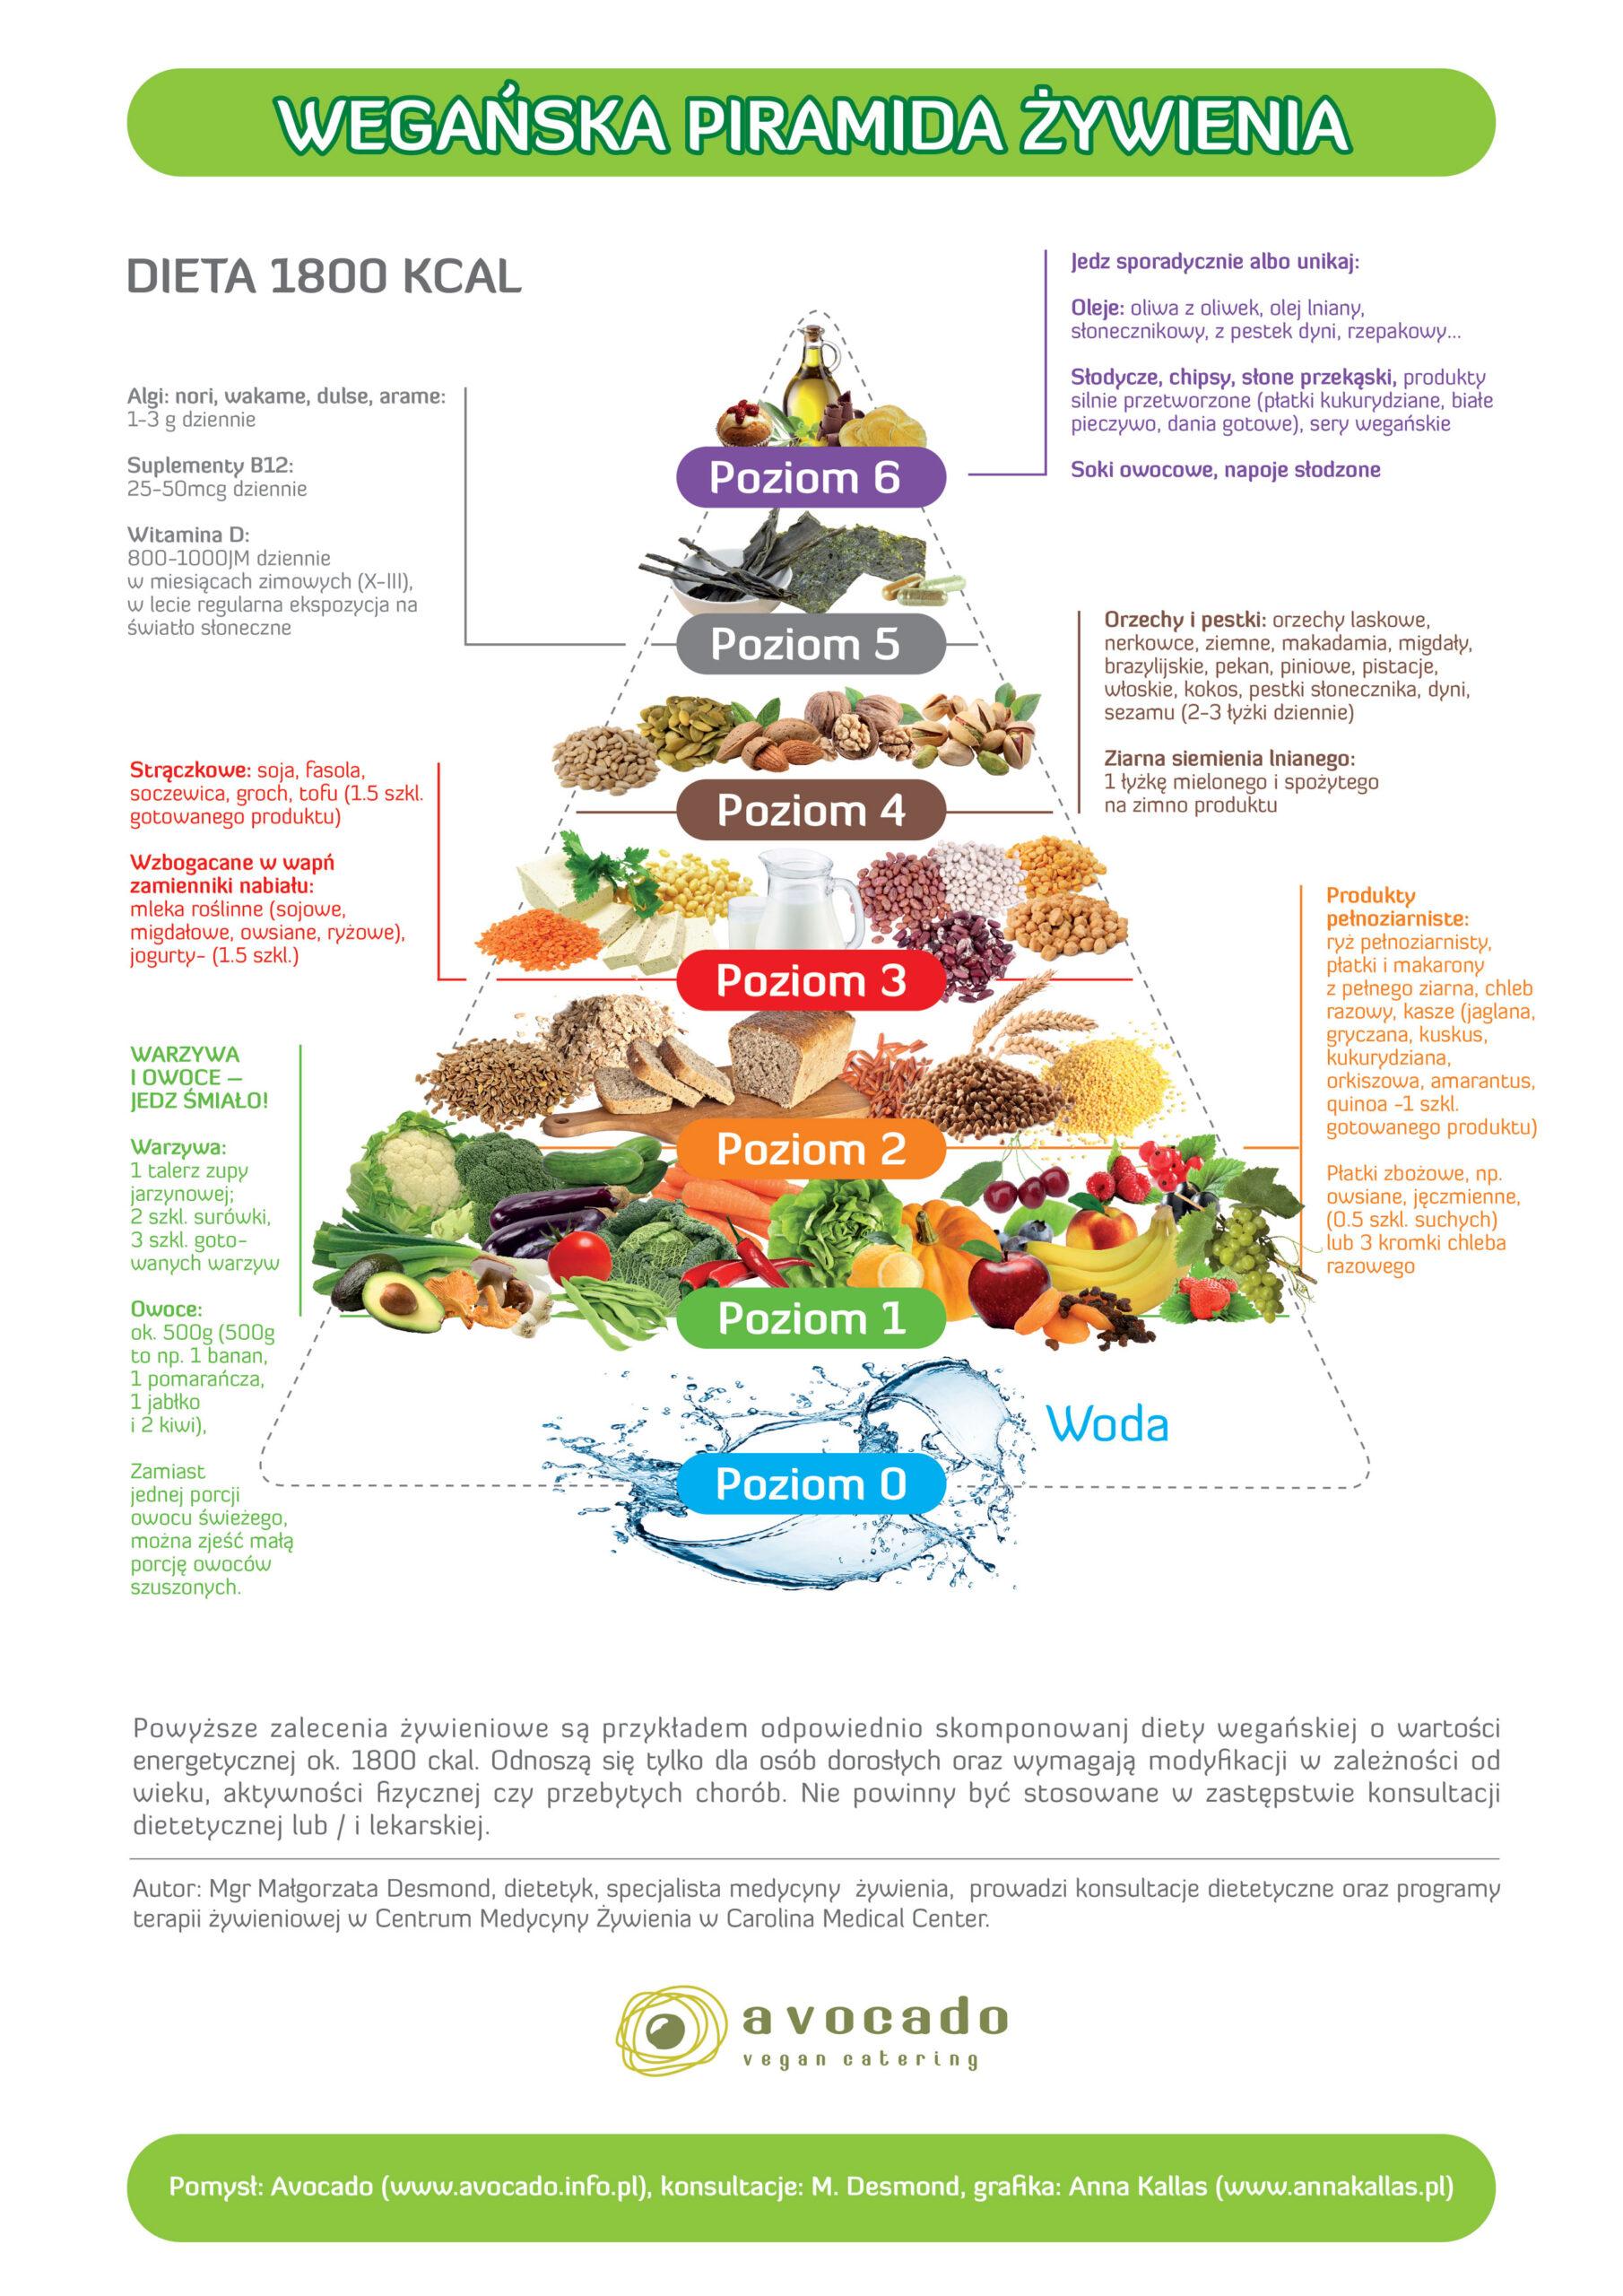 weganska-piramida-zdrowia